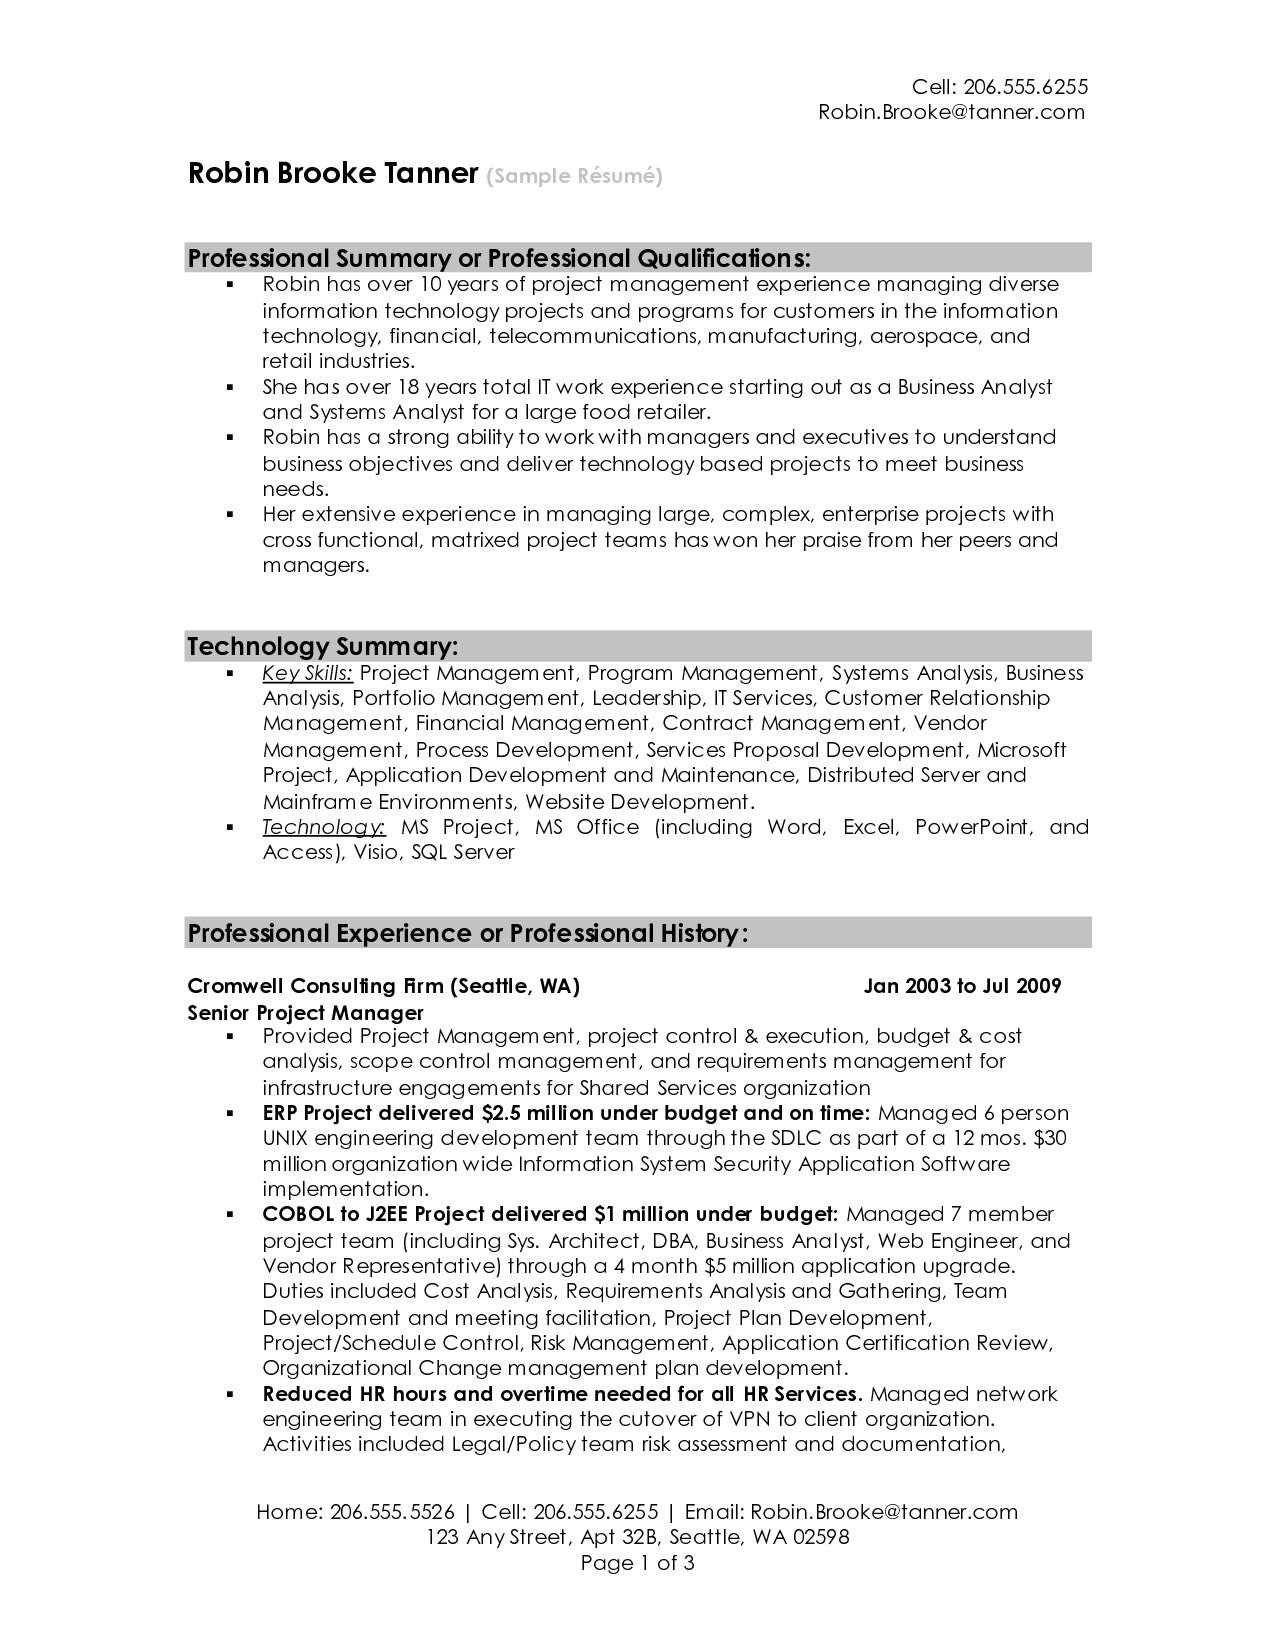 best resume samples 2015